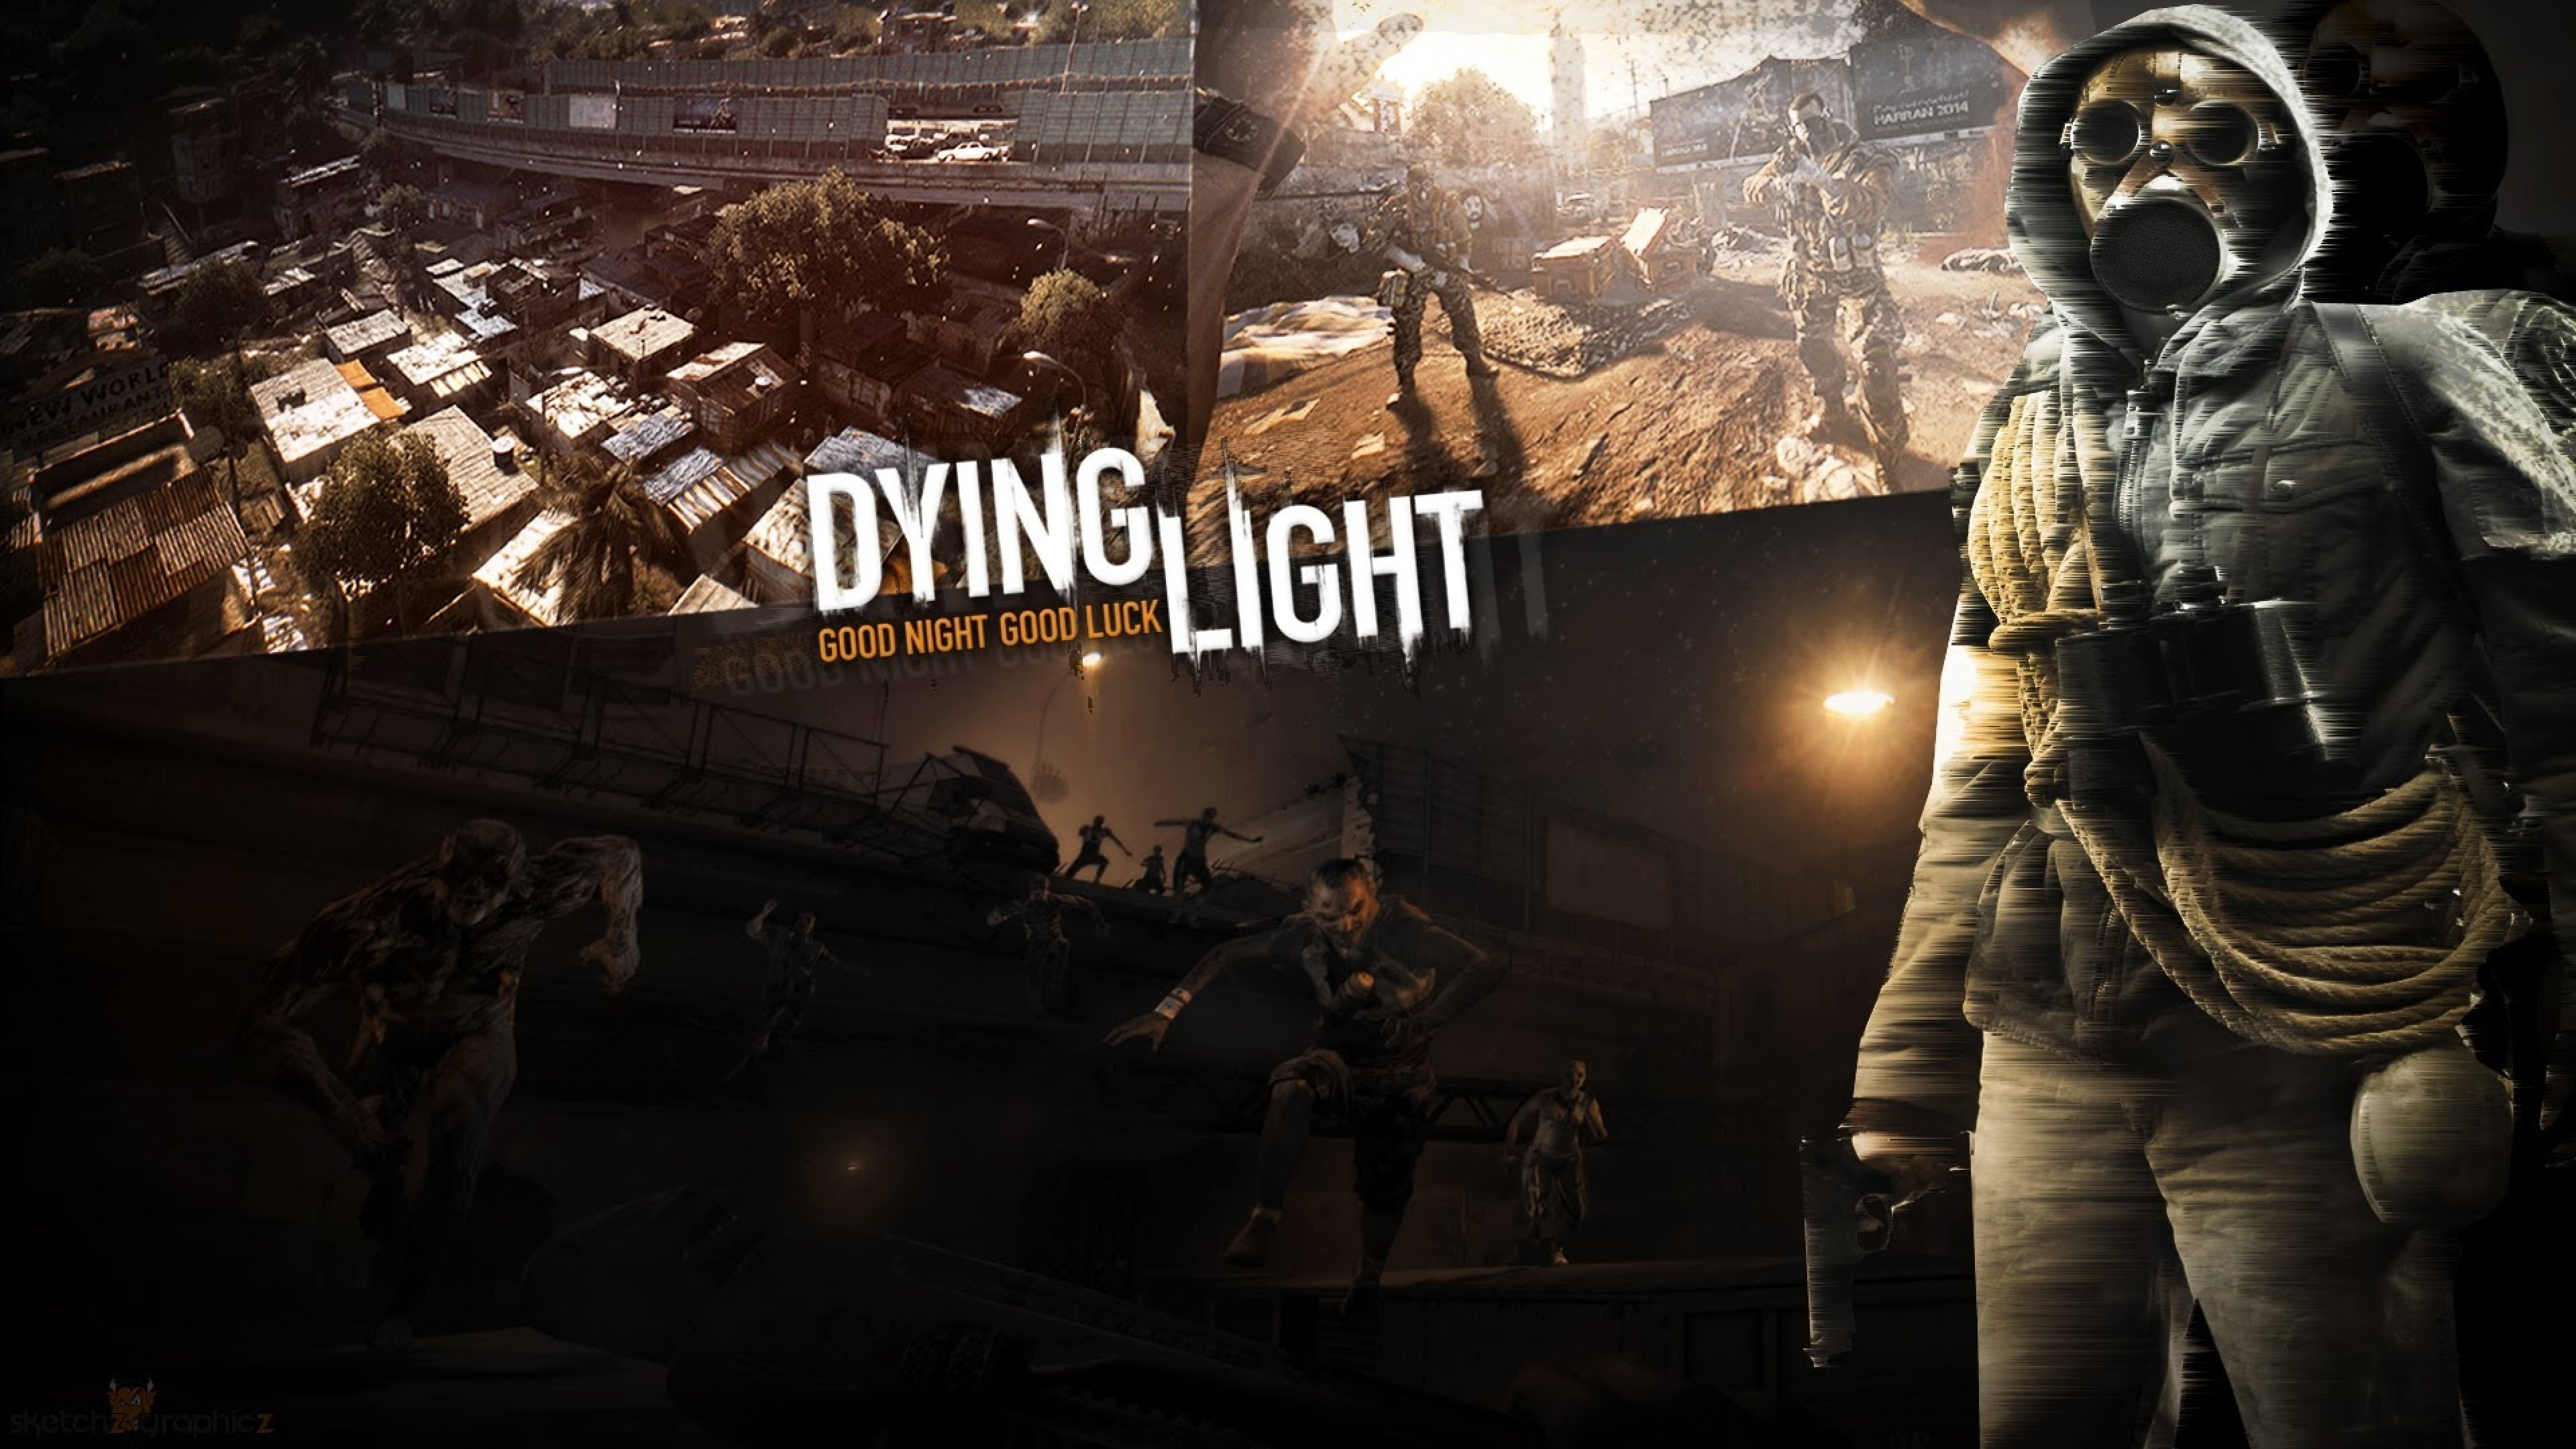 4K Ultra HD Dying light Wallpapers HD, Desktop Backgrounds